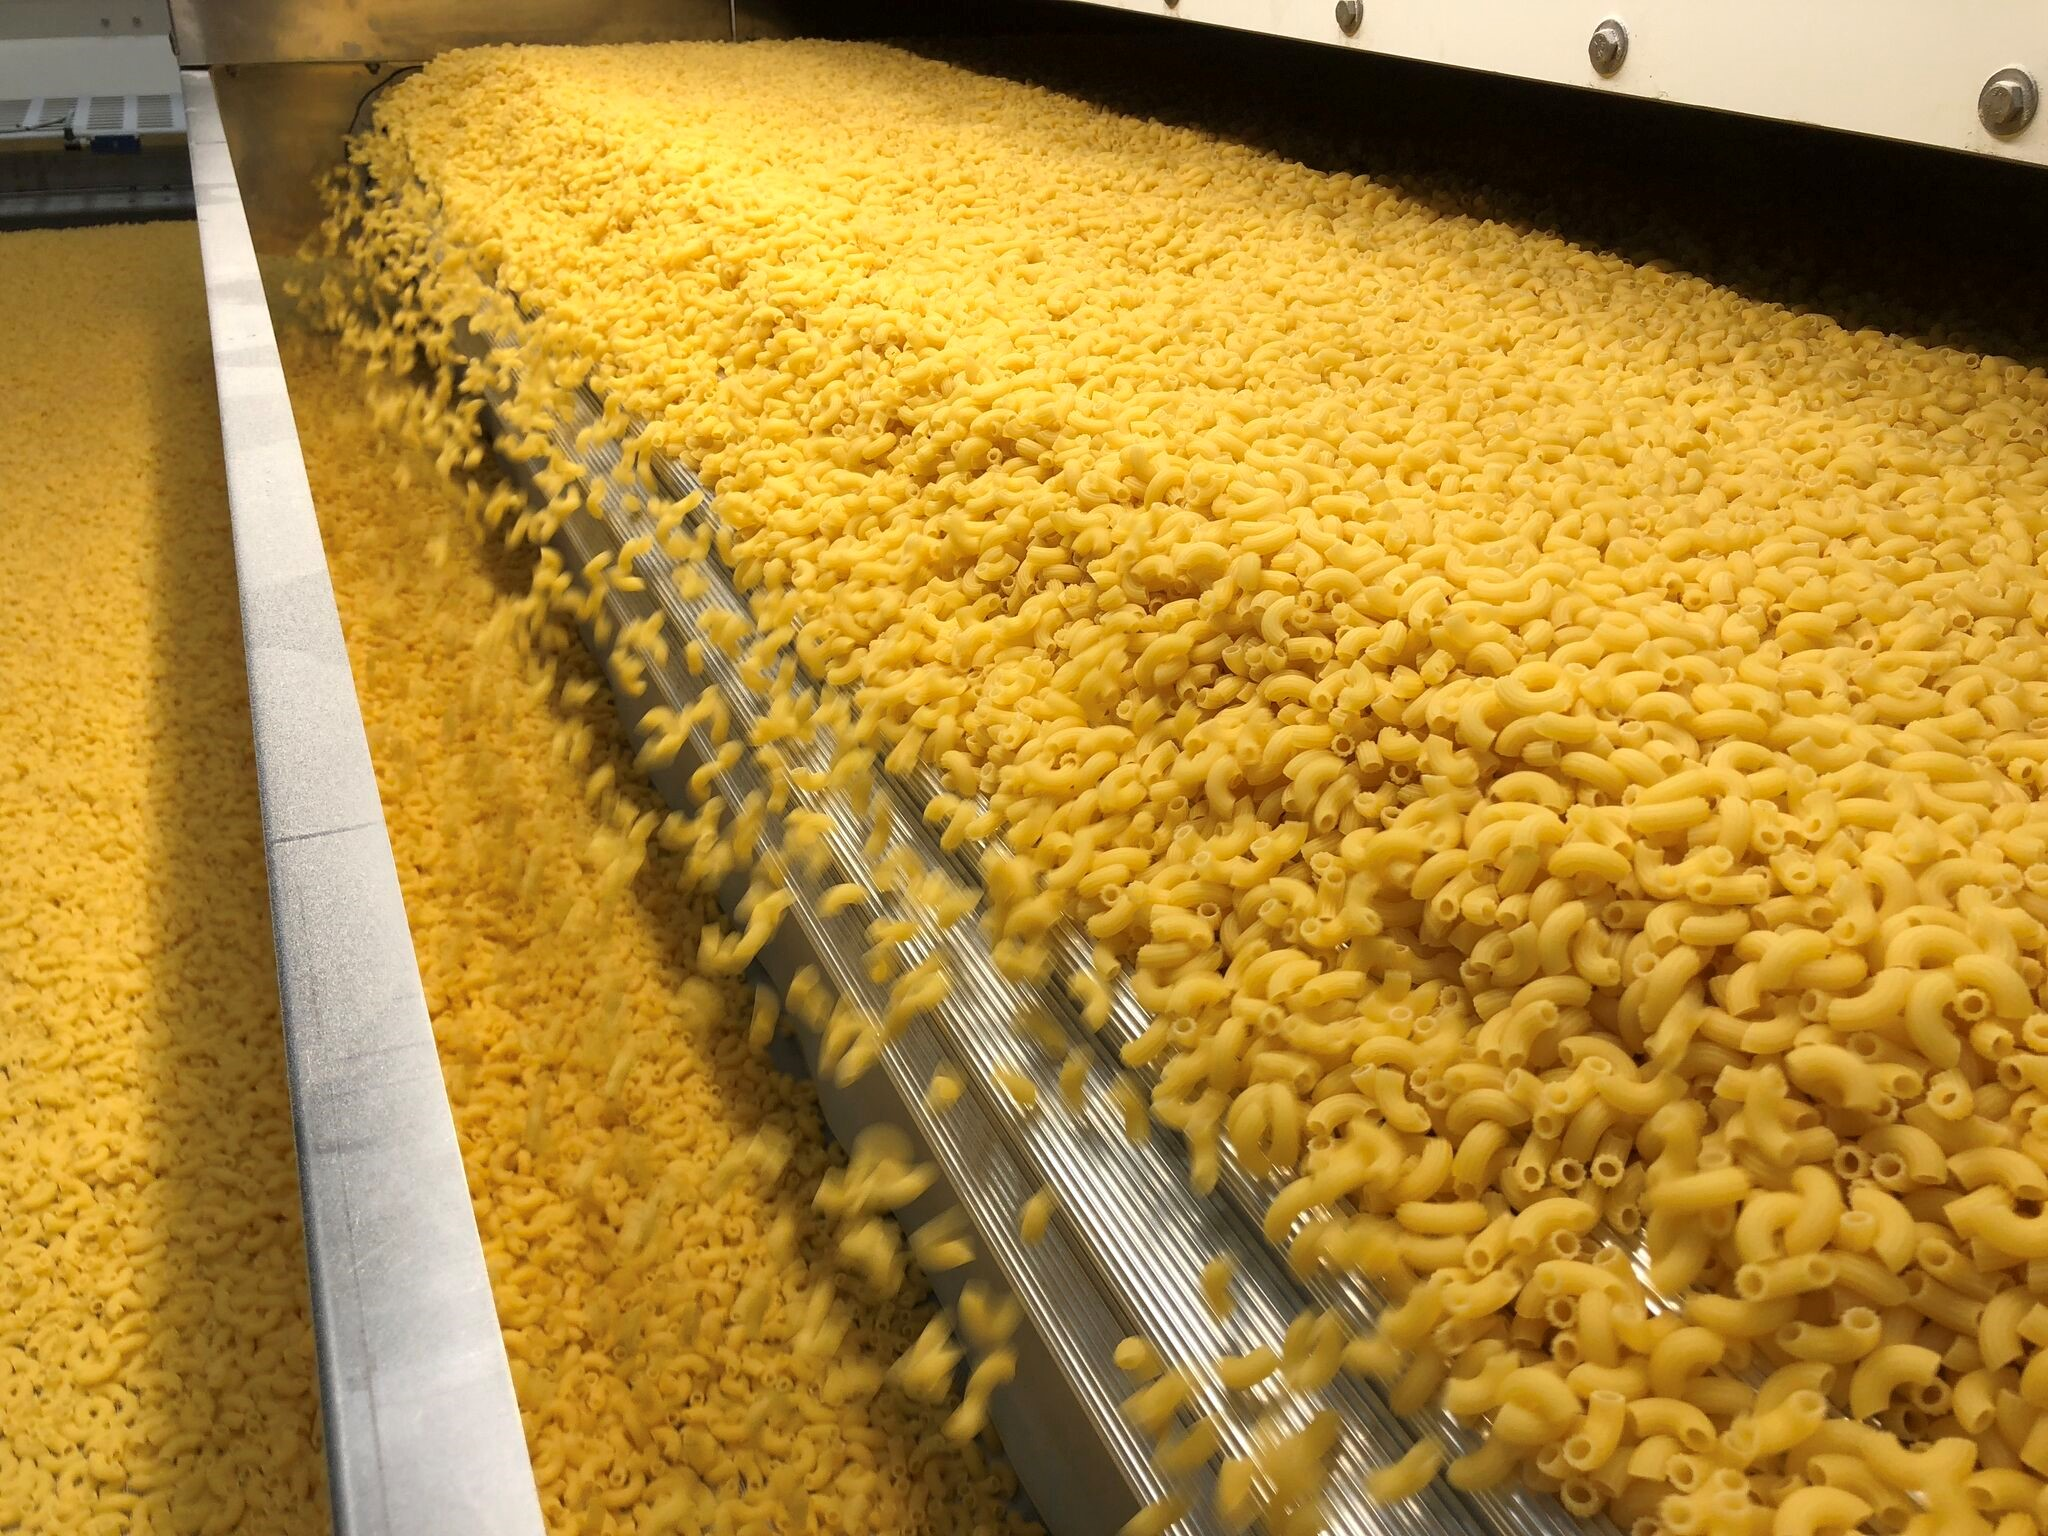 gyermelyi_pasta_manufacturer_production